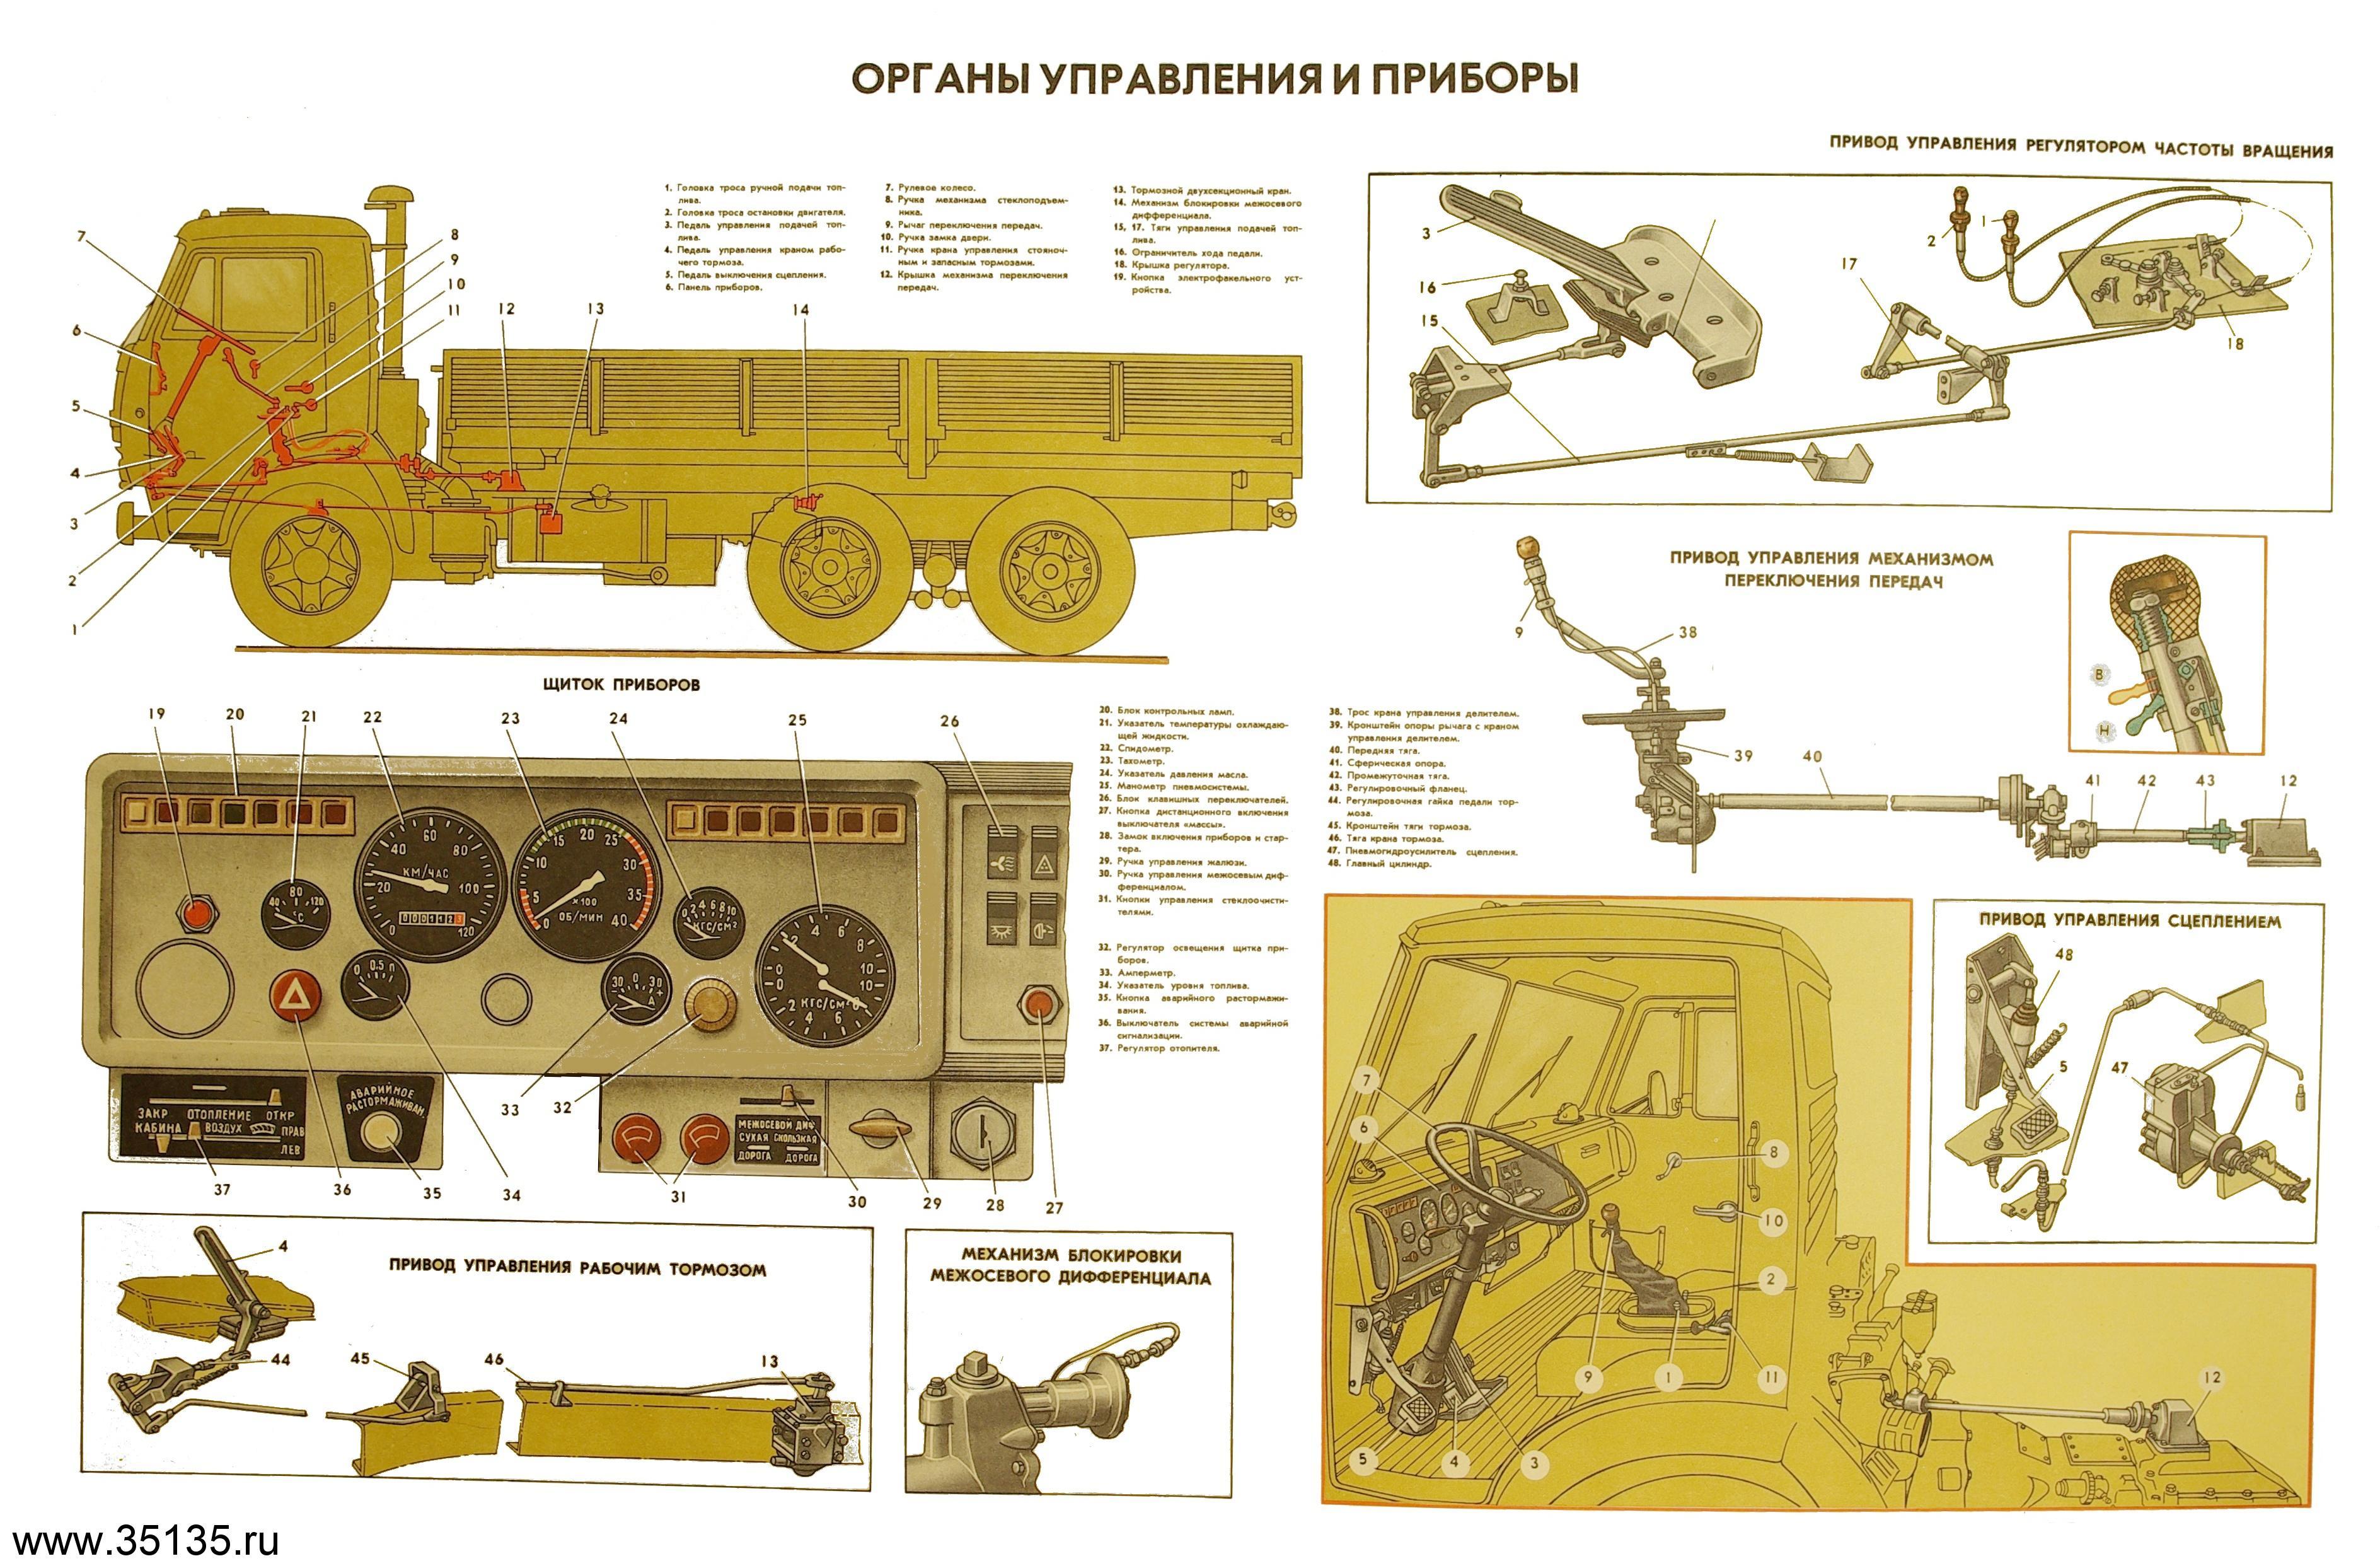 КамАЗ 5410: технические характеристики, грузоподъемность ...